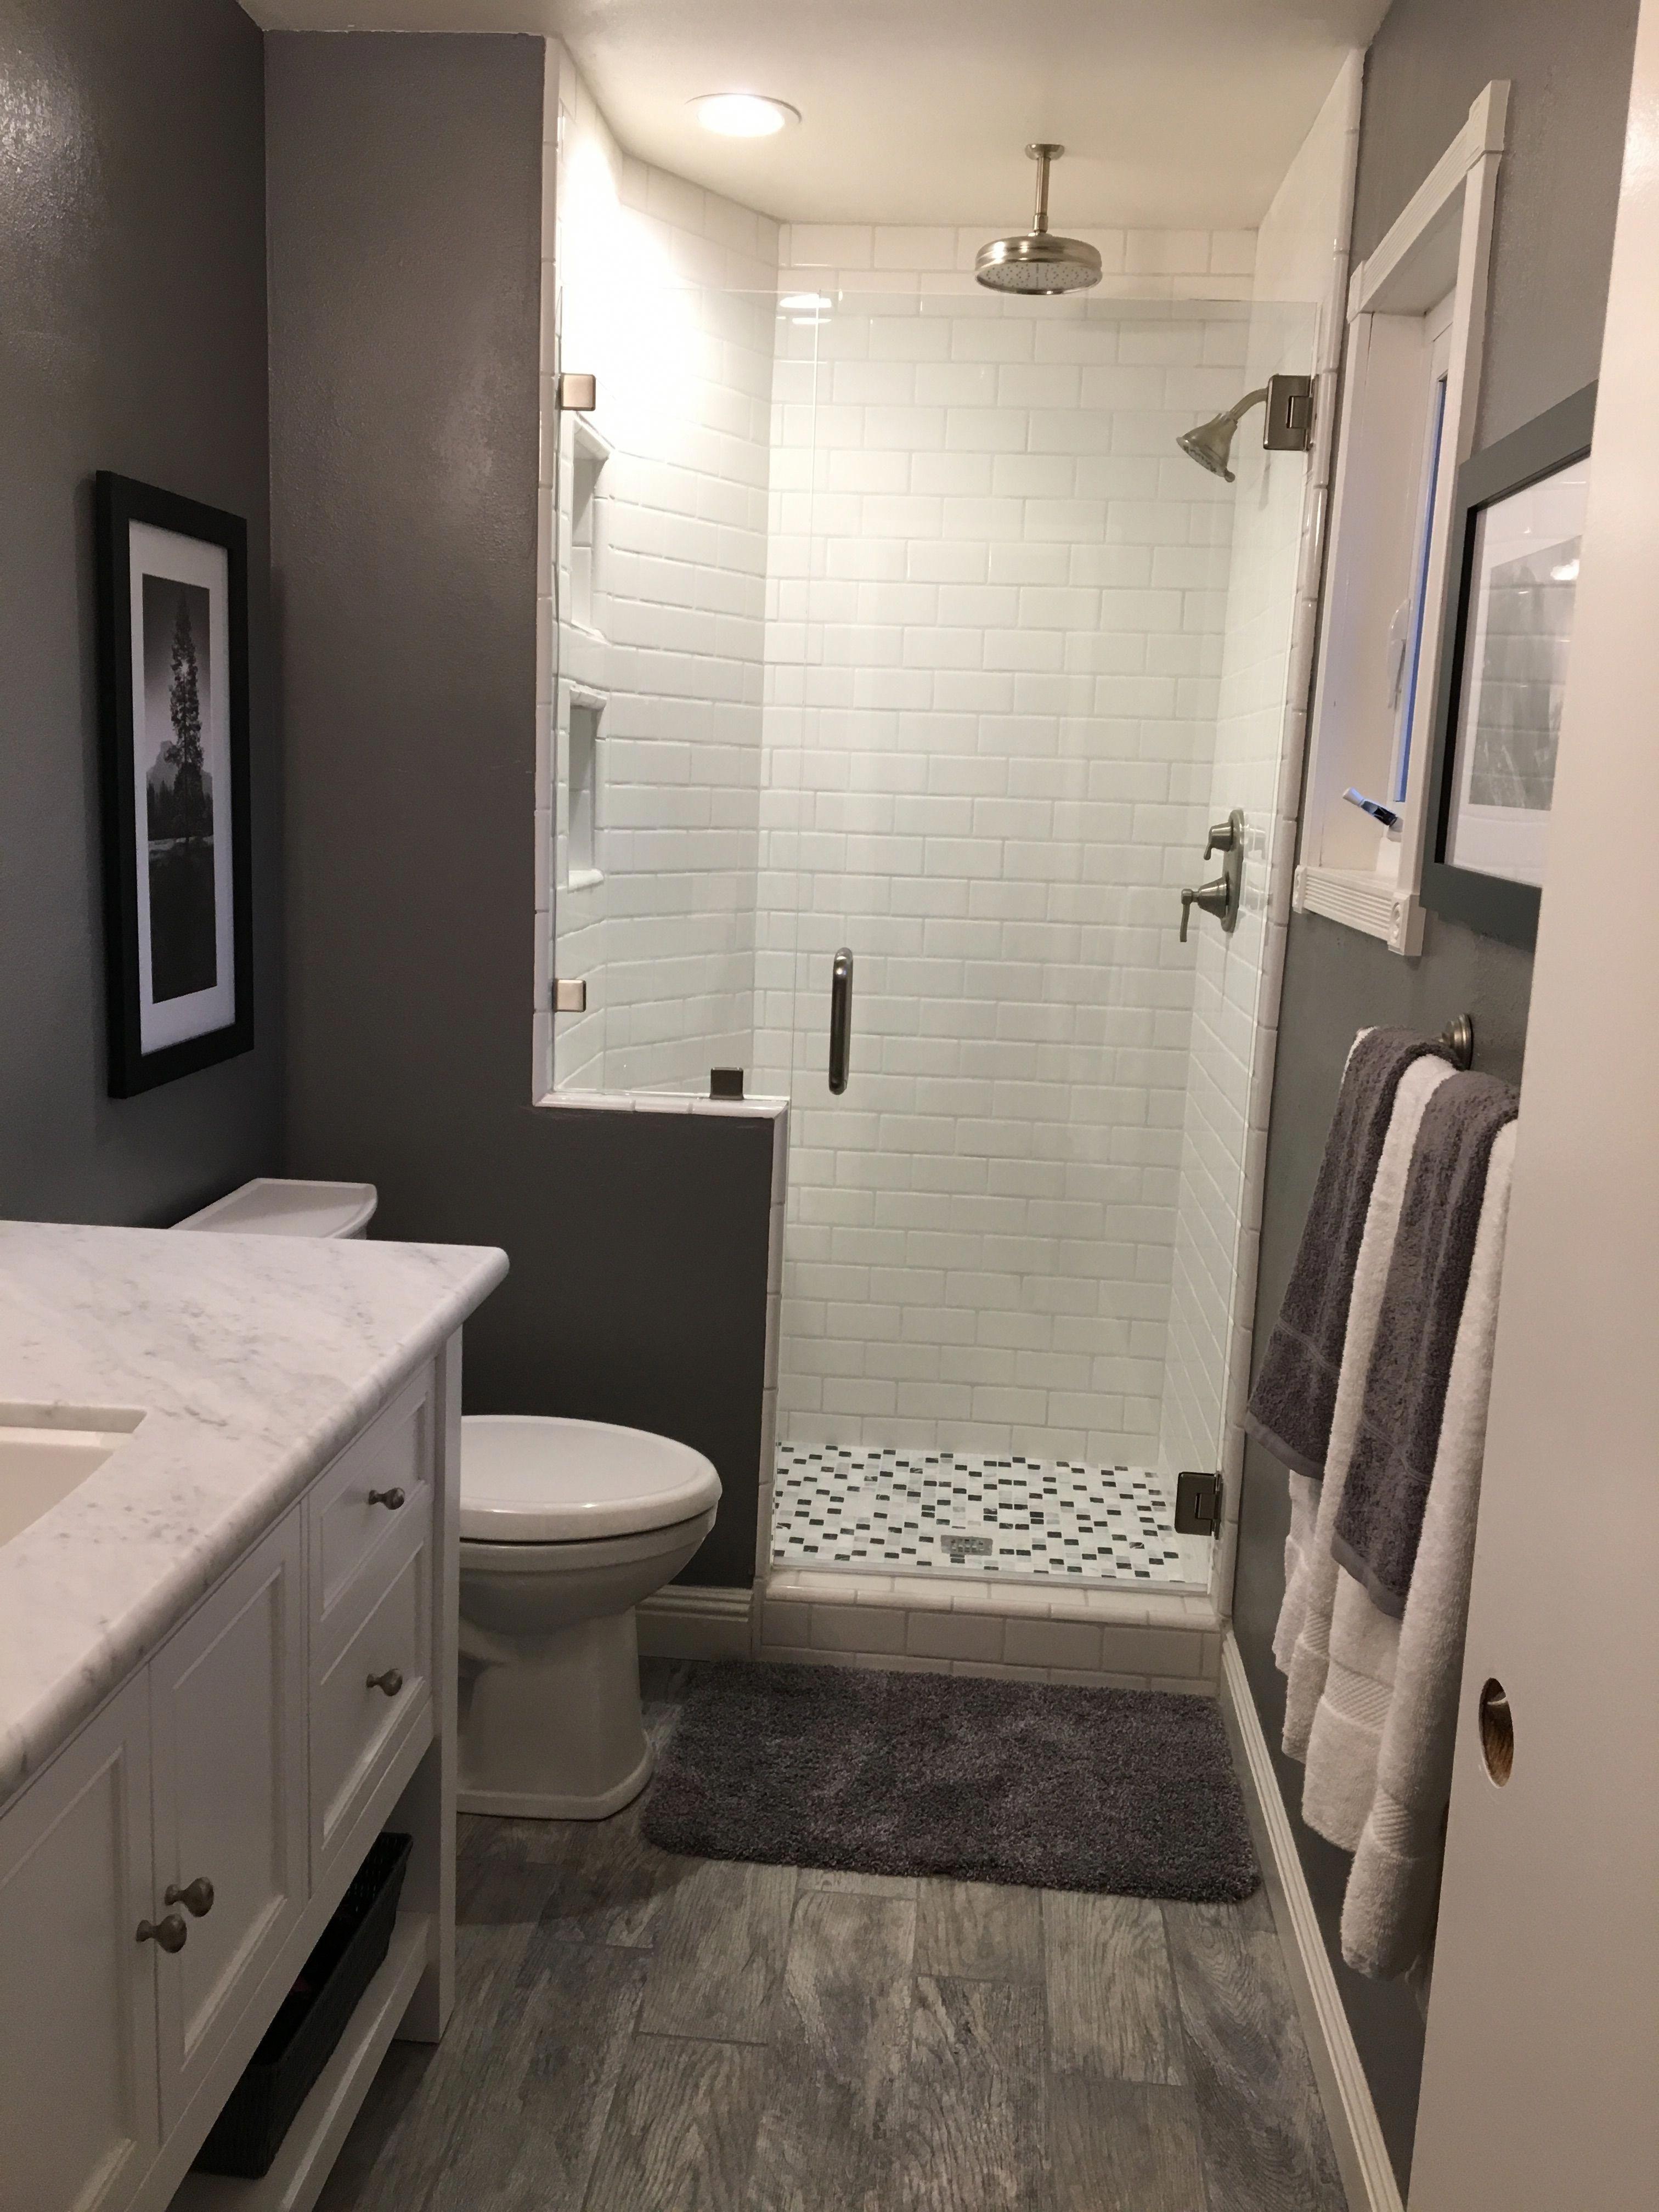 Best Small Bathroom Ideas Blackredbathroomideas Small Bathroom Remodel Basement Bathroom Remodeling Bathrooms Remodel